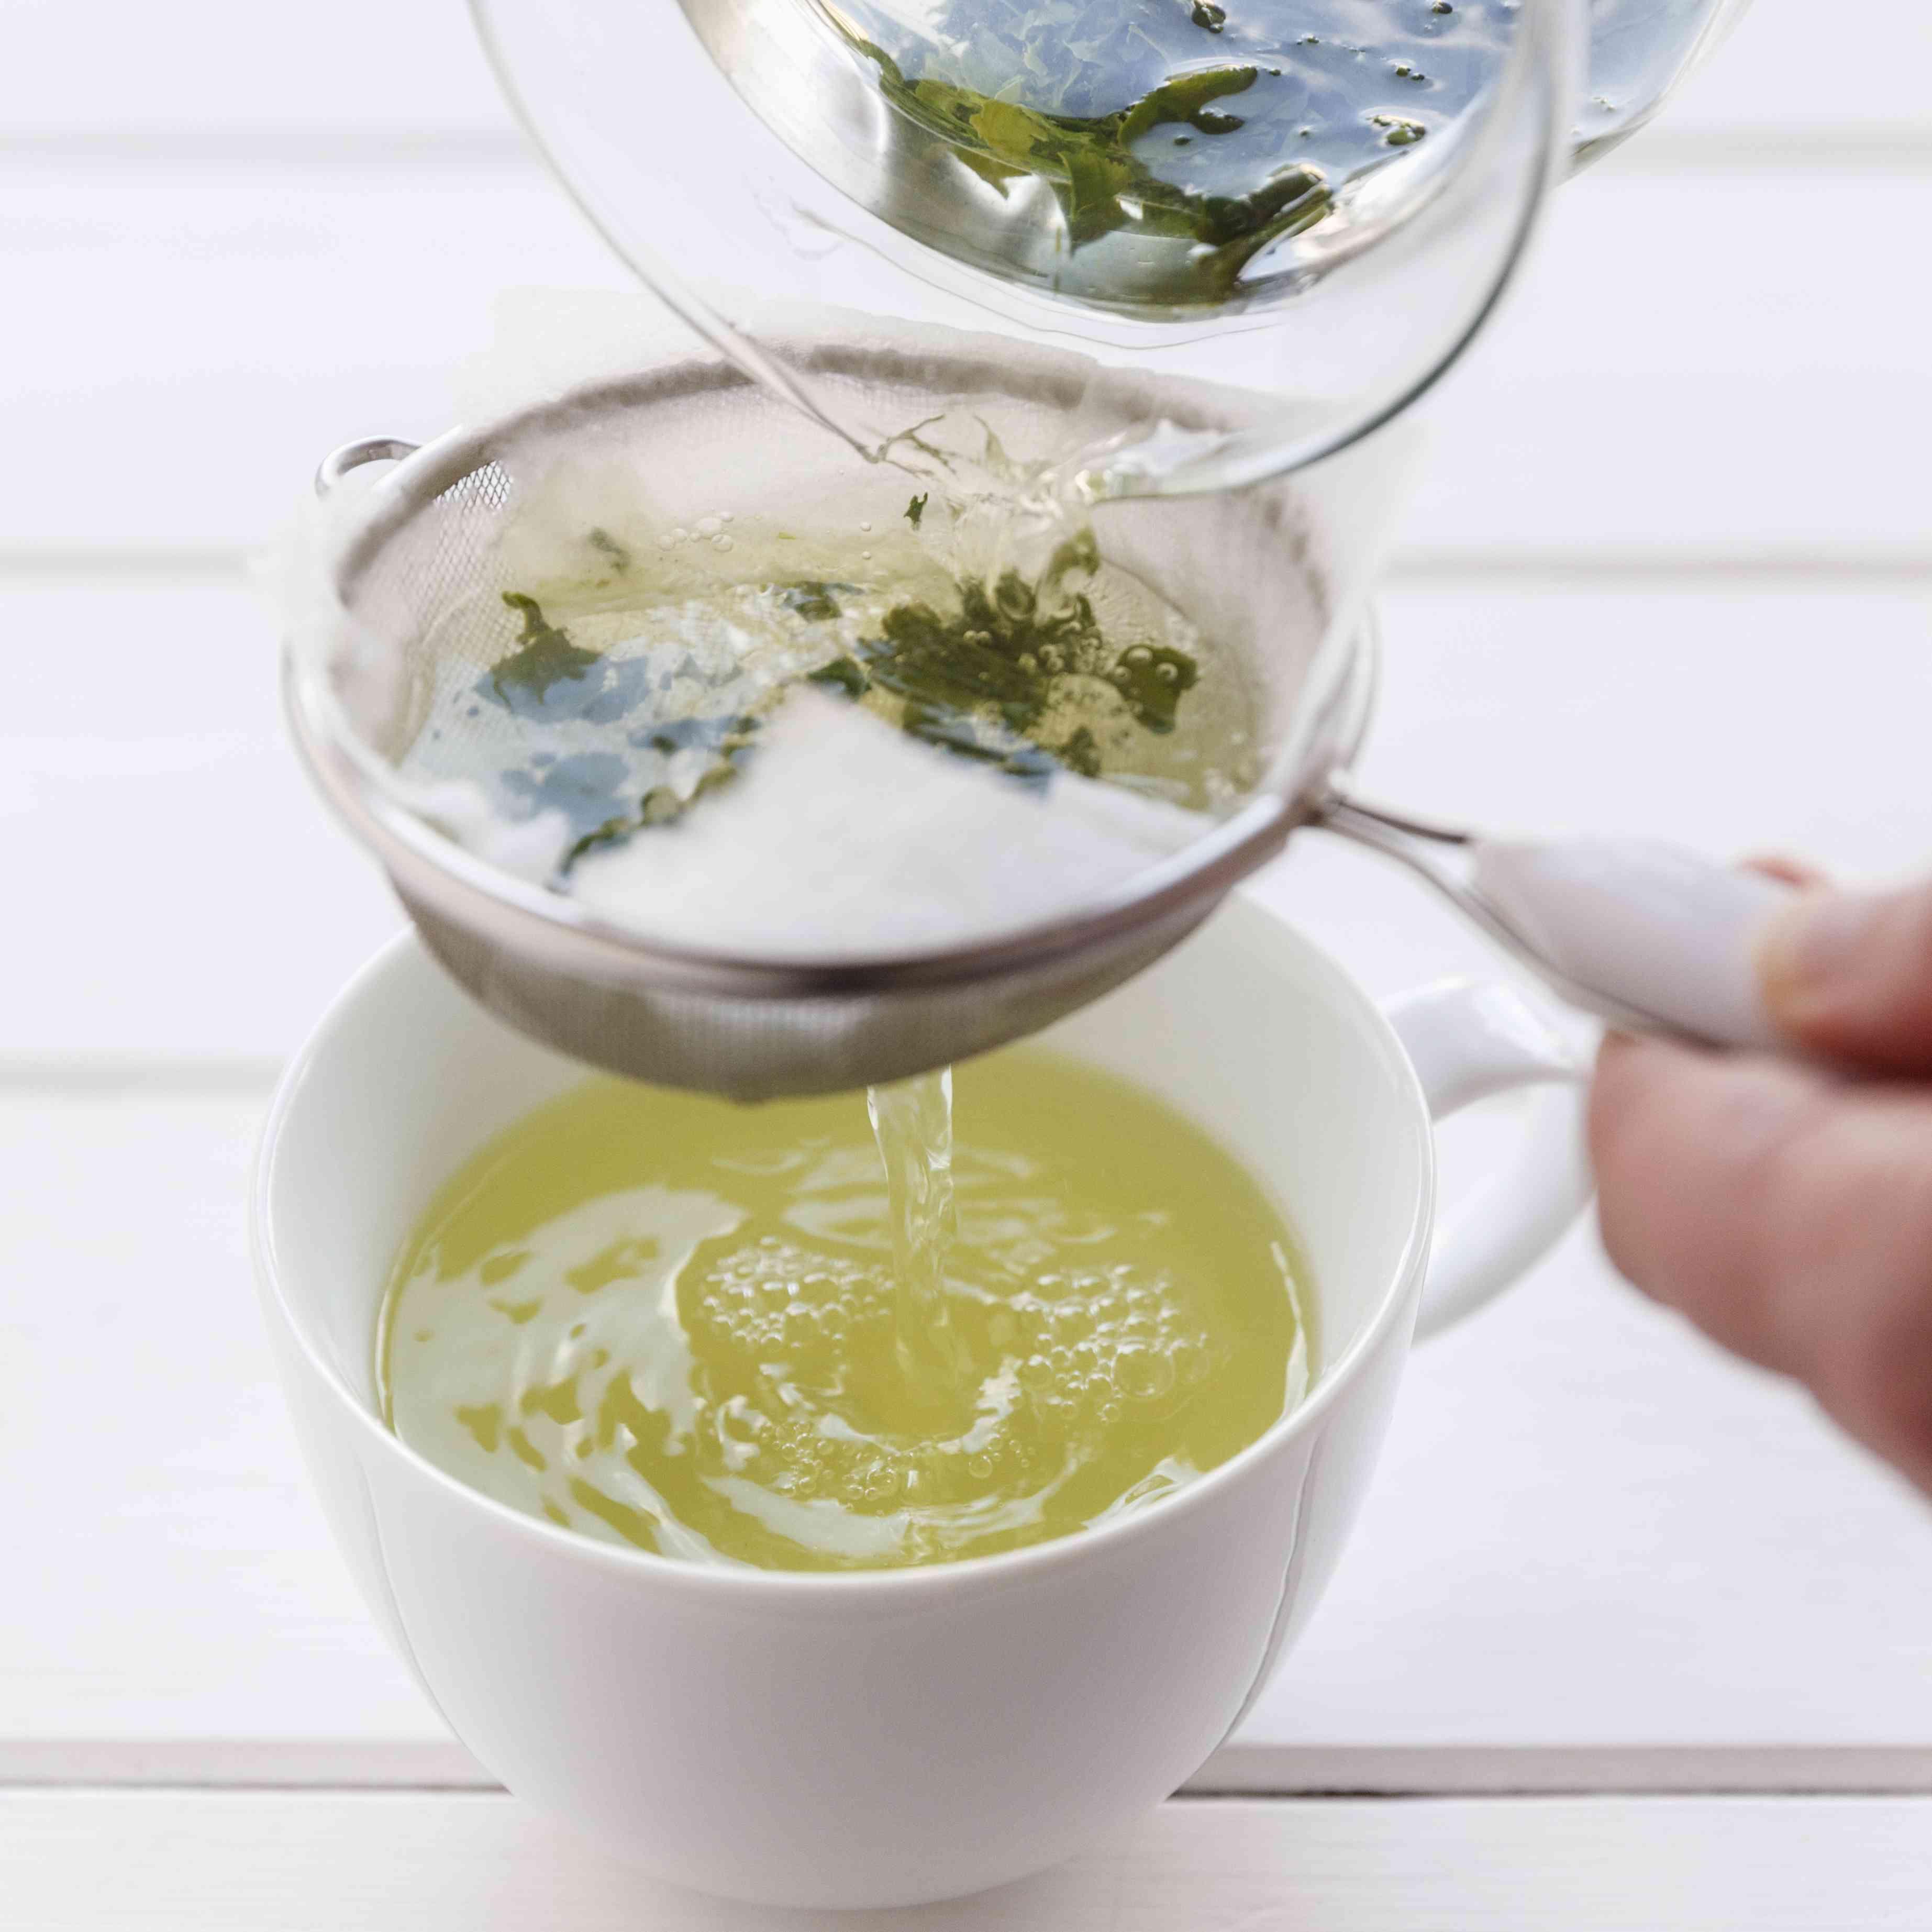 Preparation of green tea